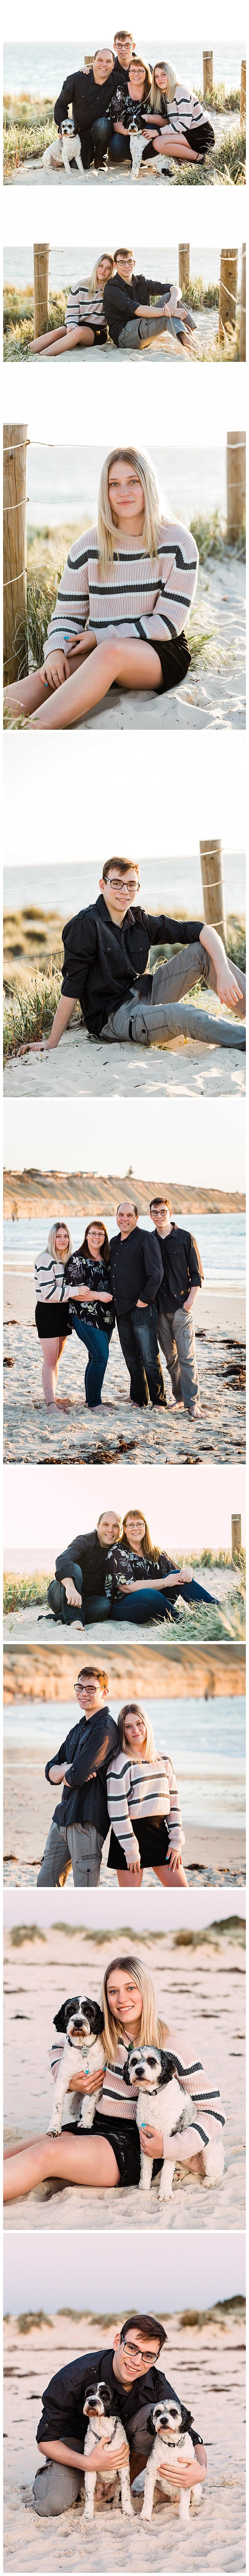 mclarenvalefamilyphotography_0024-1.jpg